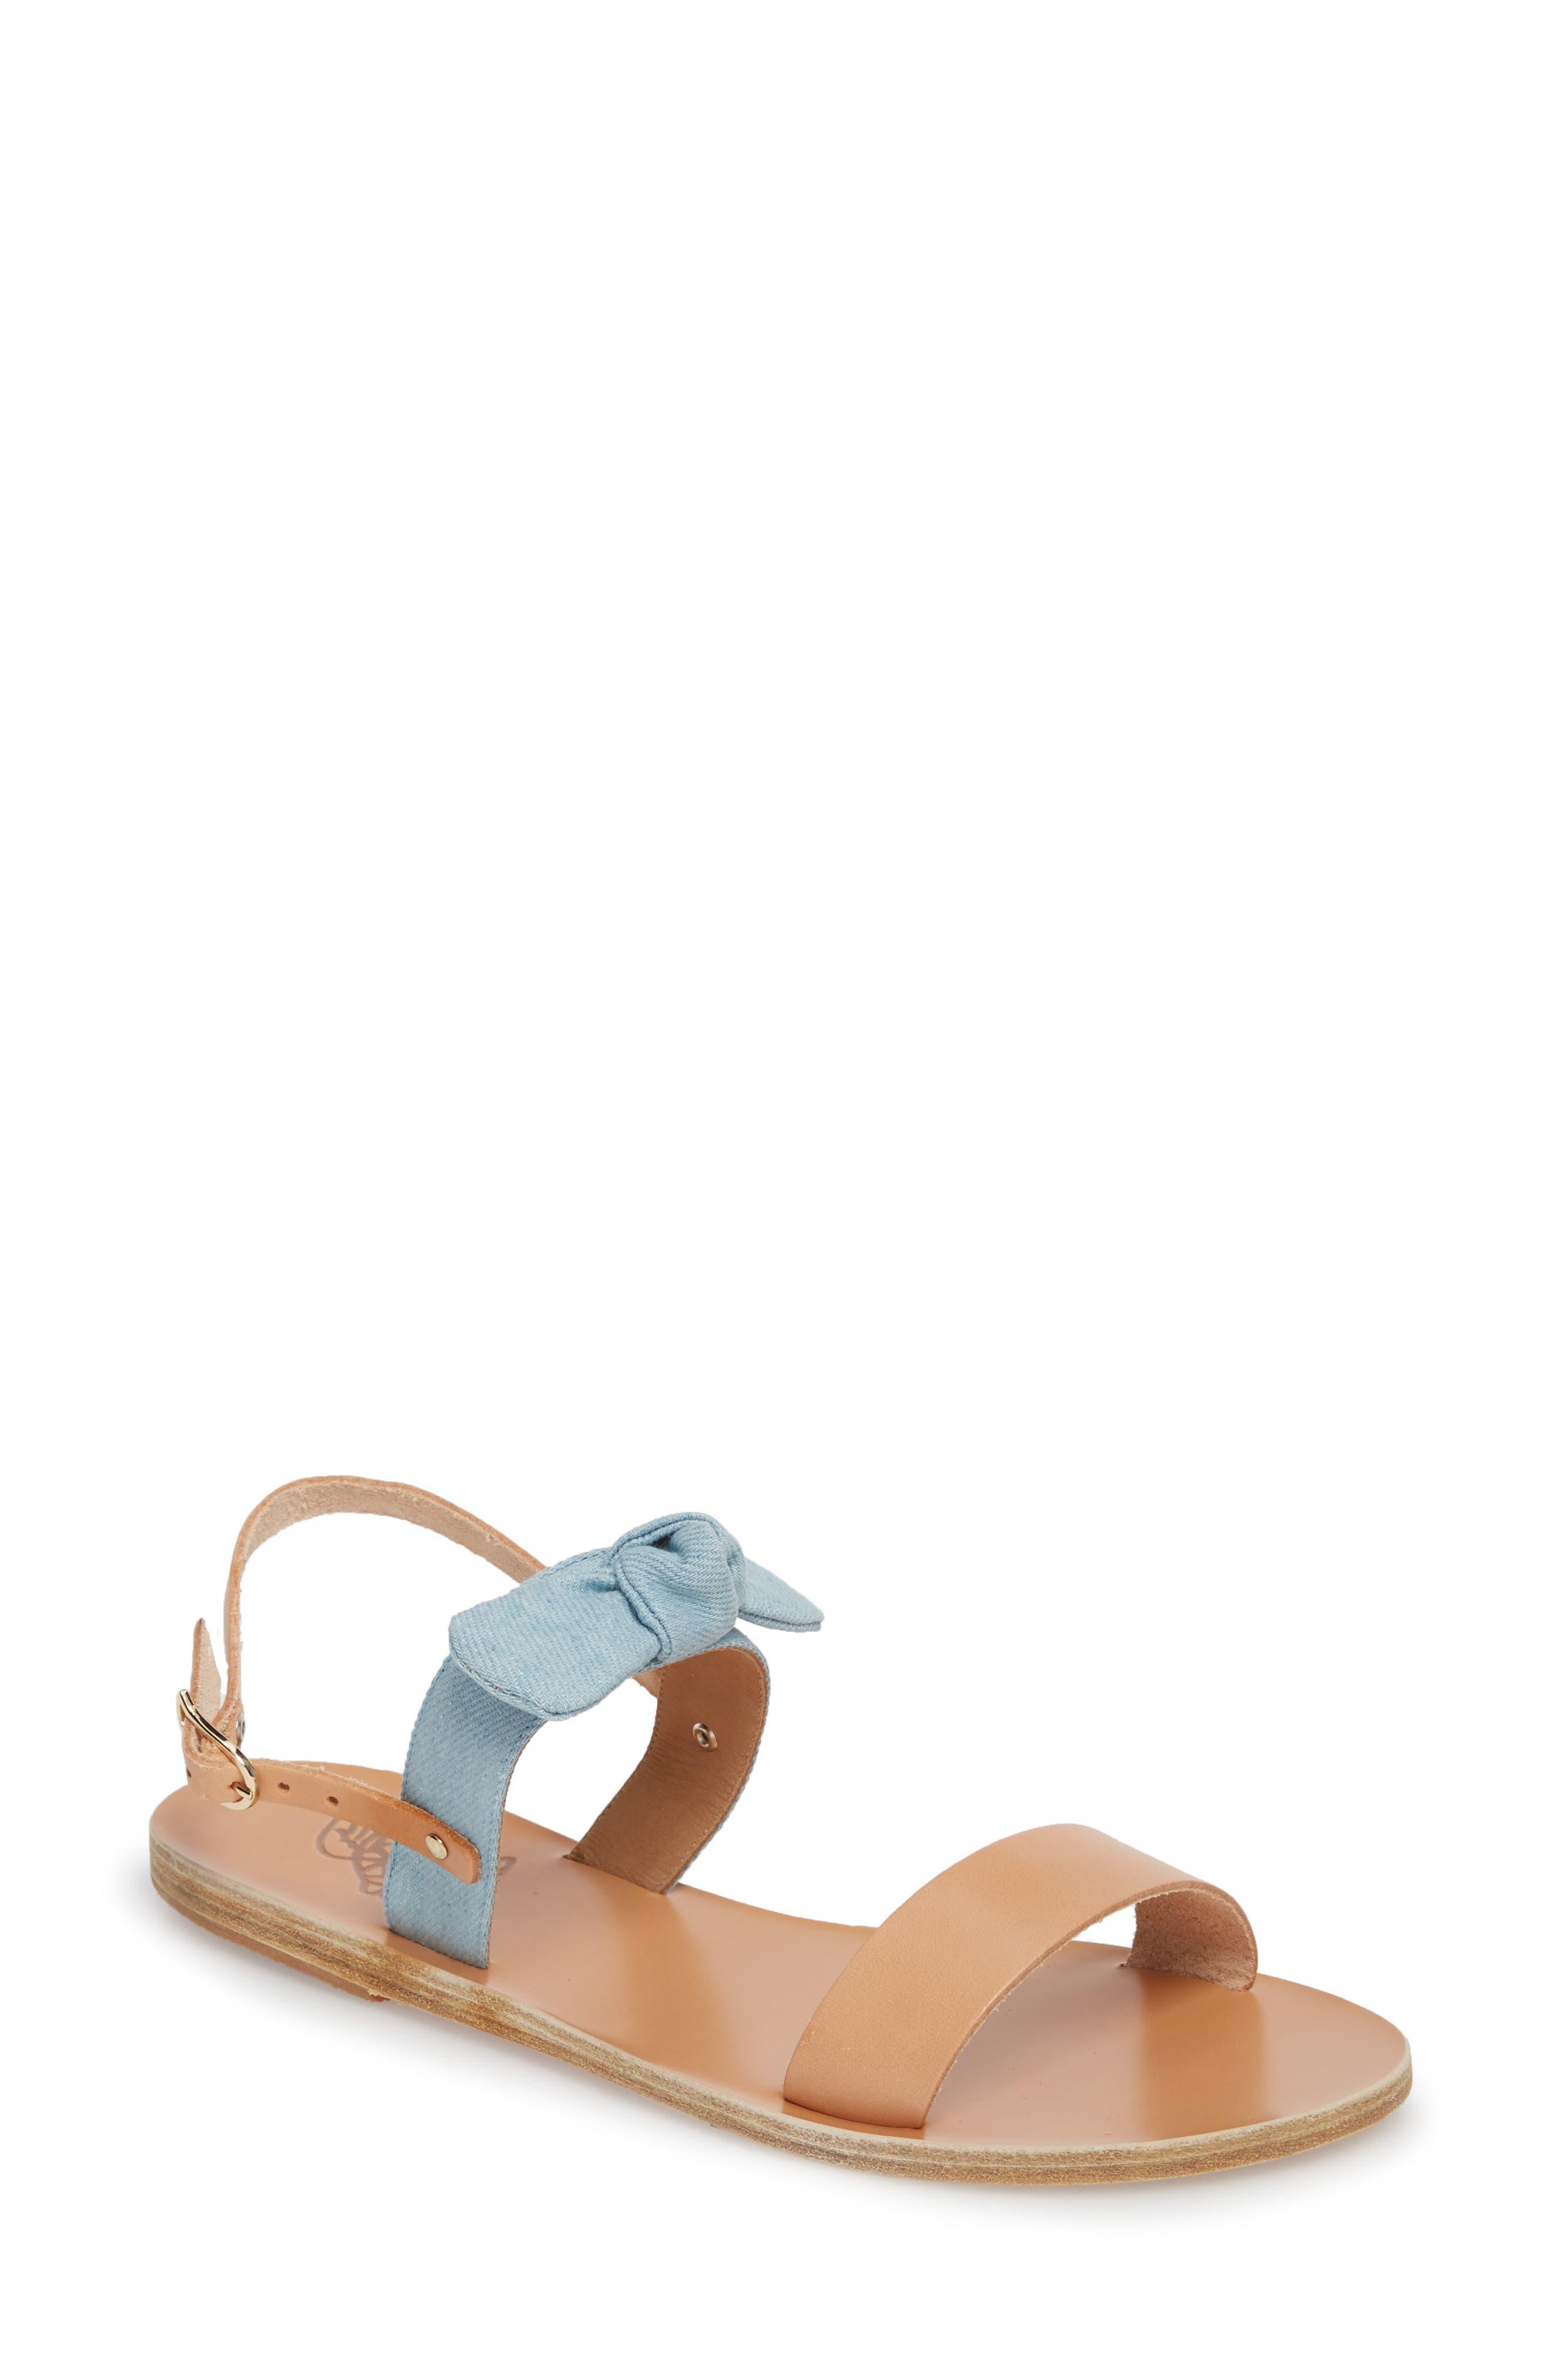 Clio Bow Sandal,                         Main,                         color, 400